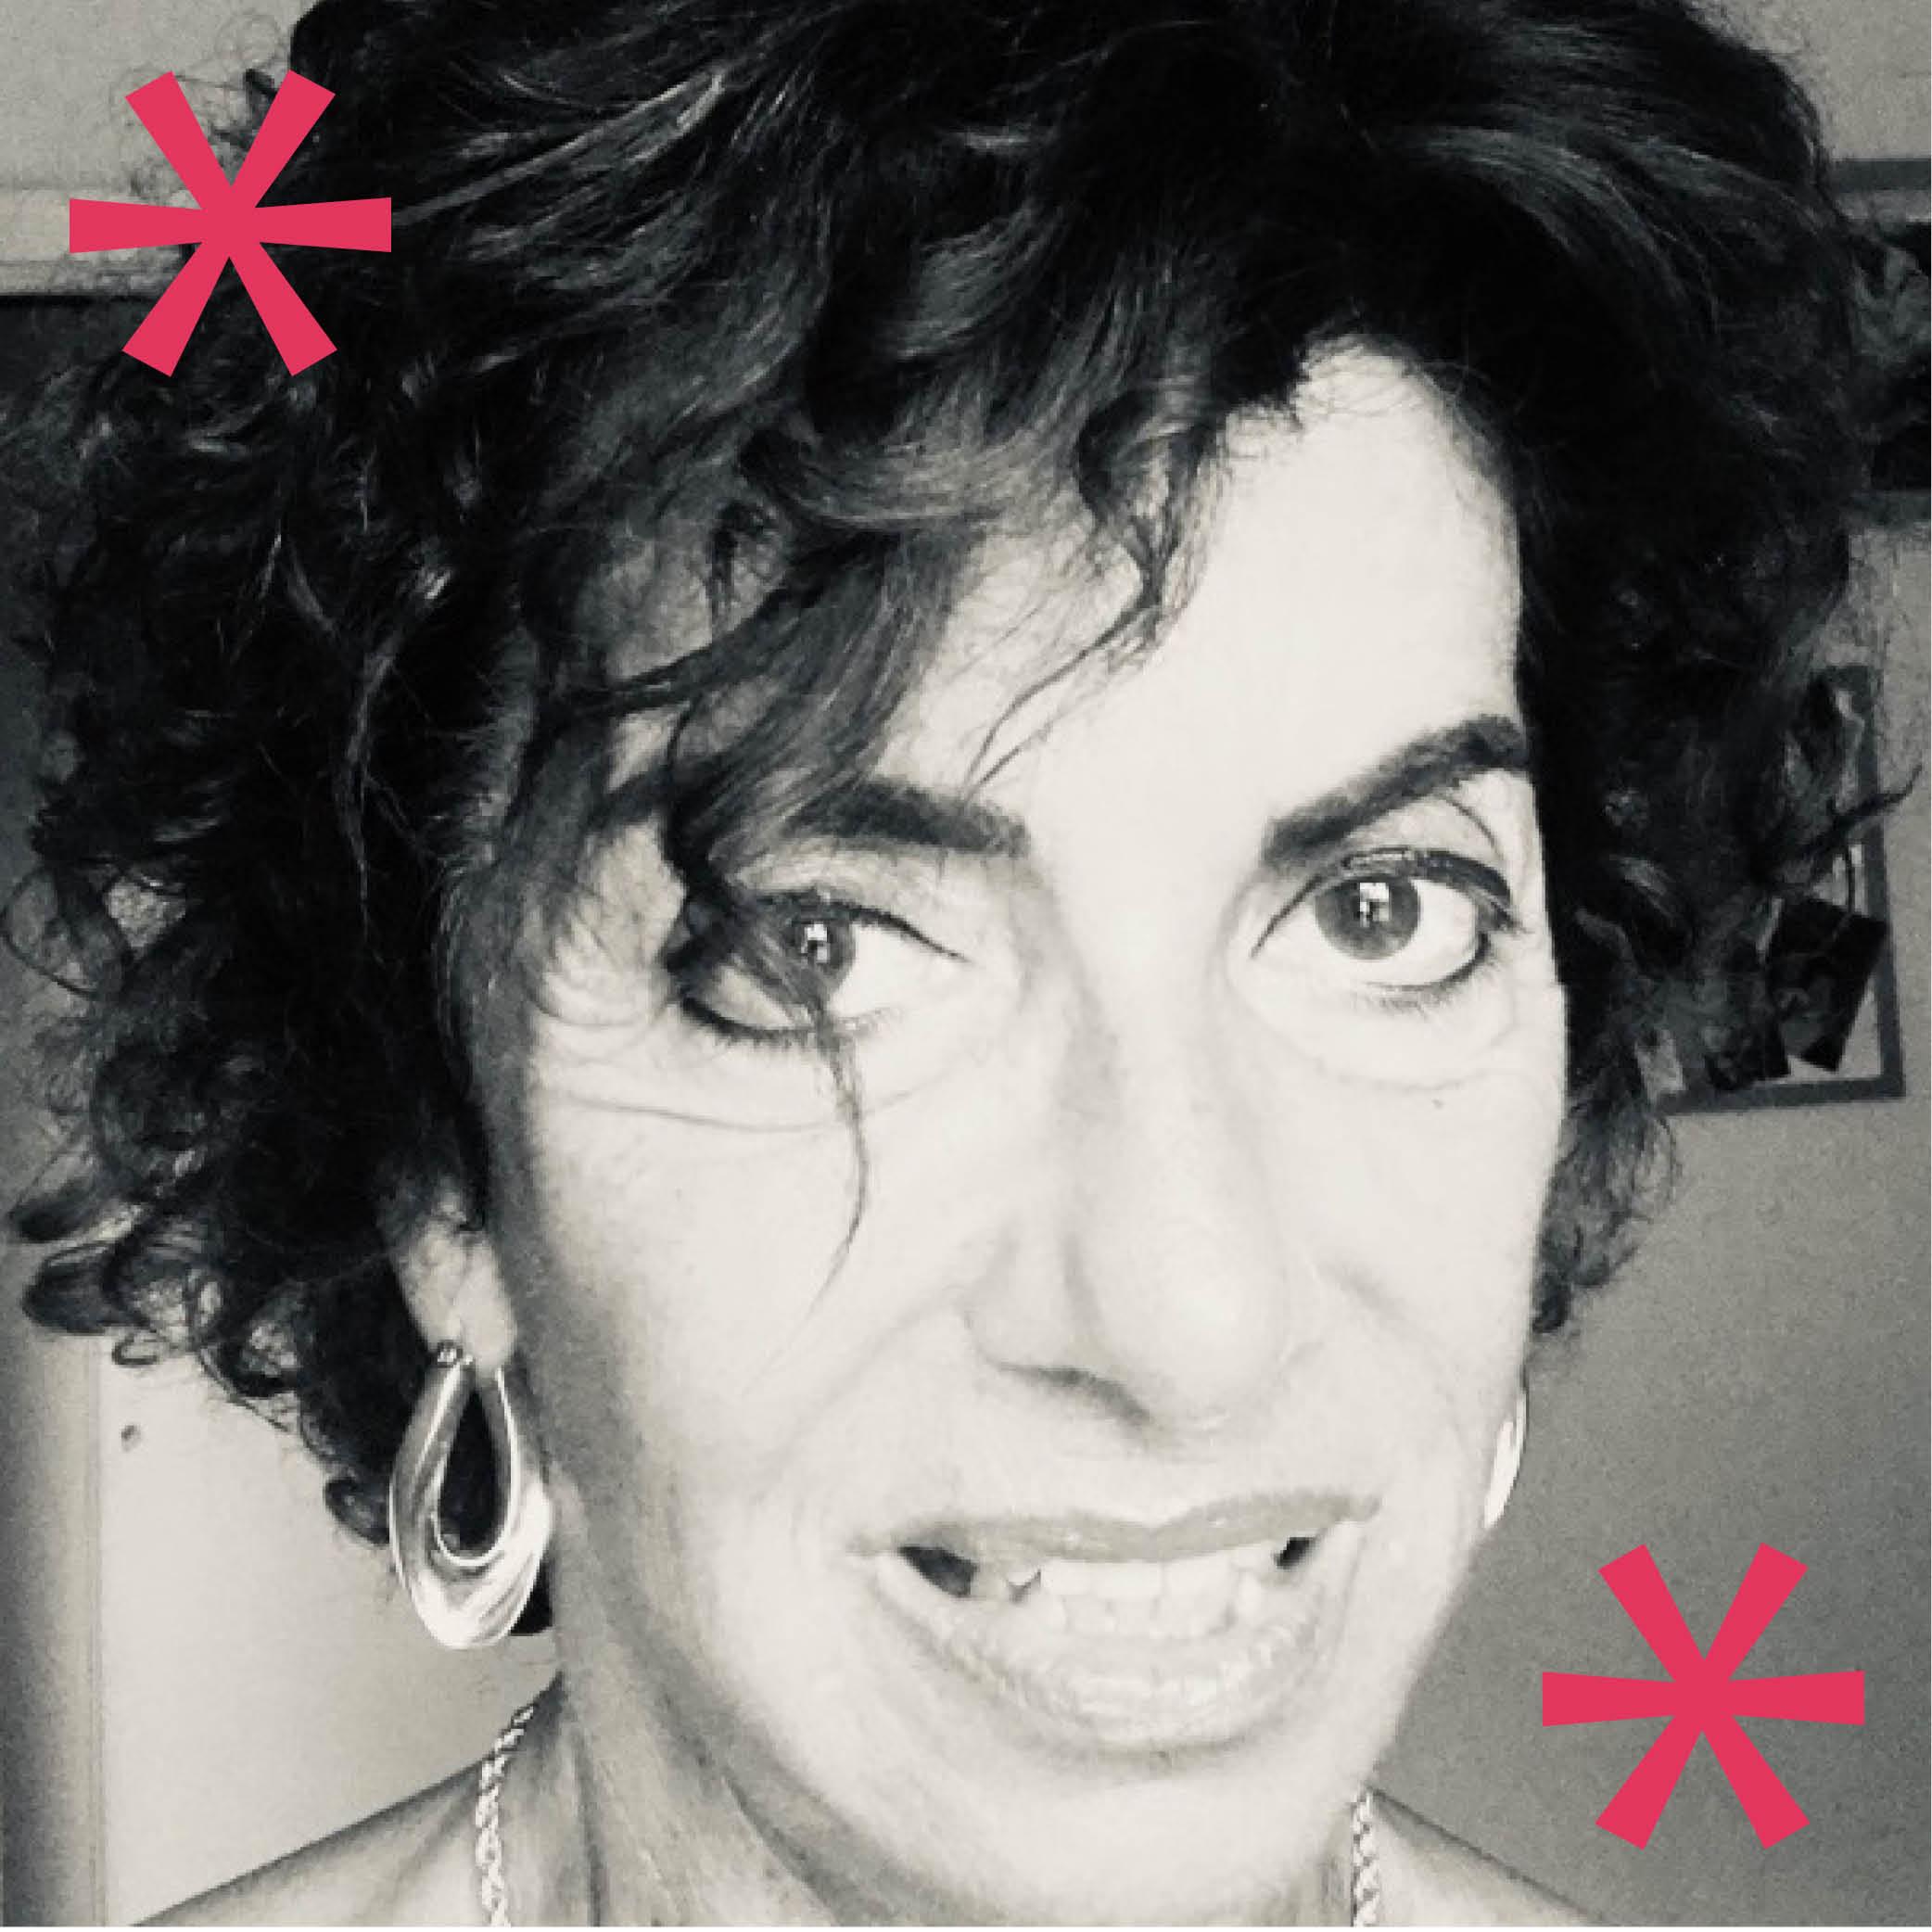 Paola Velardi